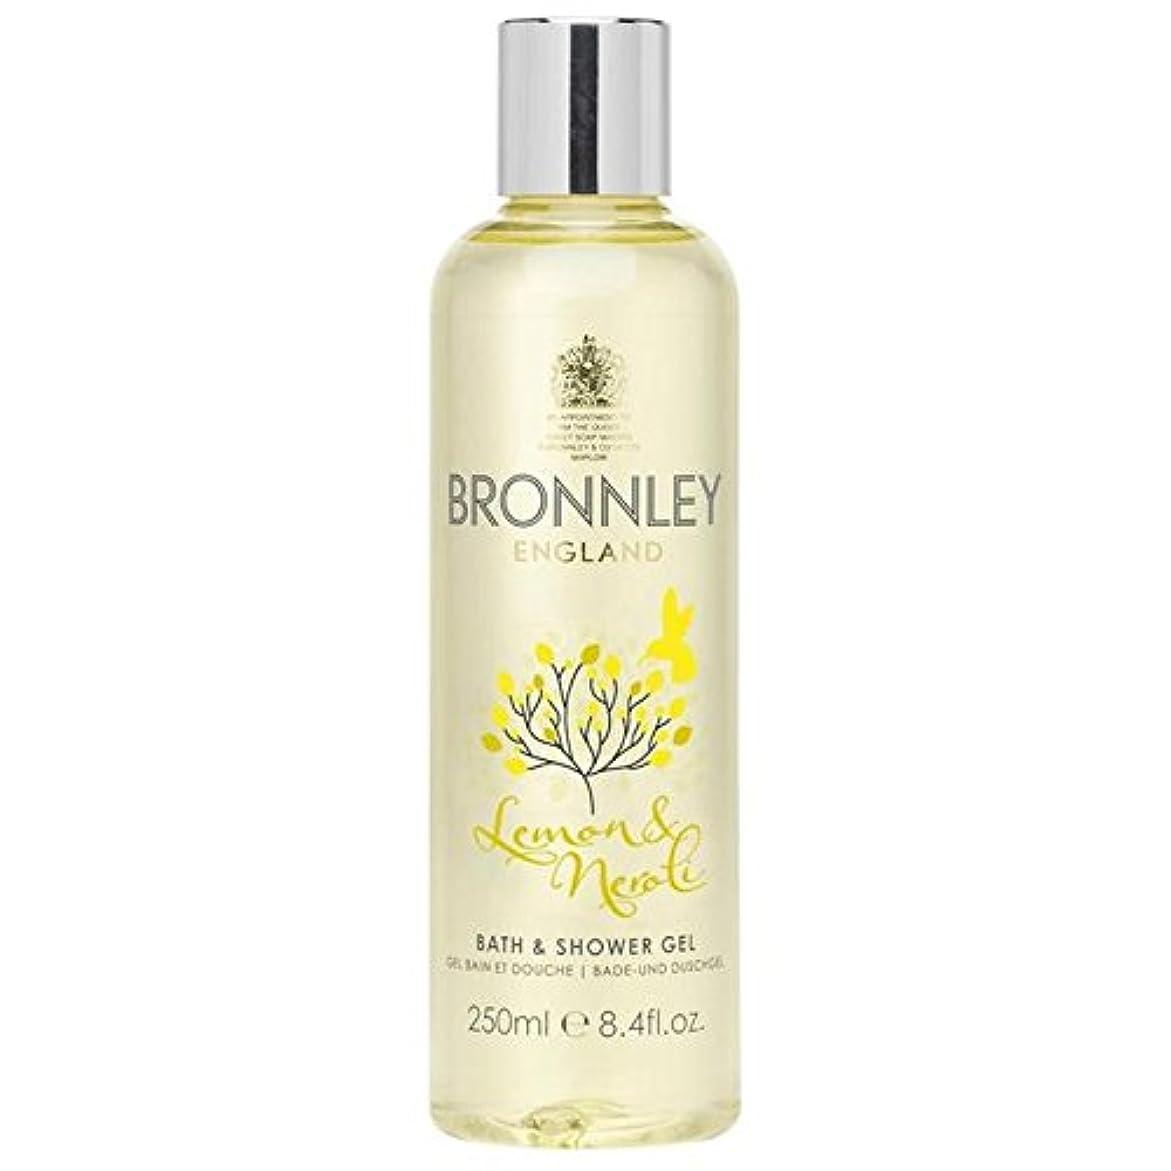 Bronnley Lemon & Neroli Bath & Shower Gel 250ml - レモン&ネロリバス&シャワージェル250ミリリットル [並行輸入品]